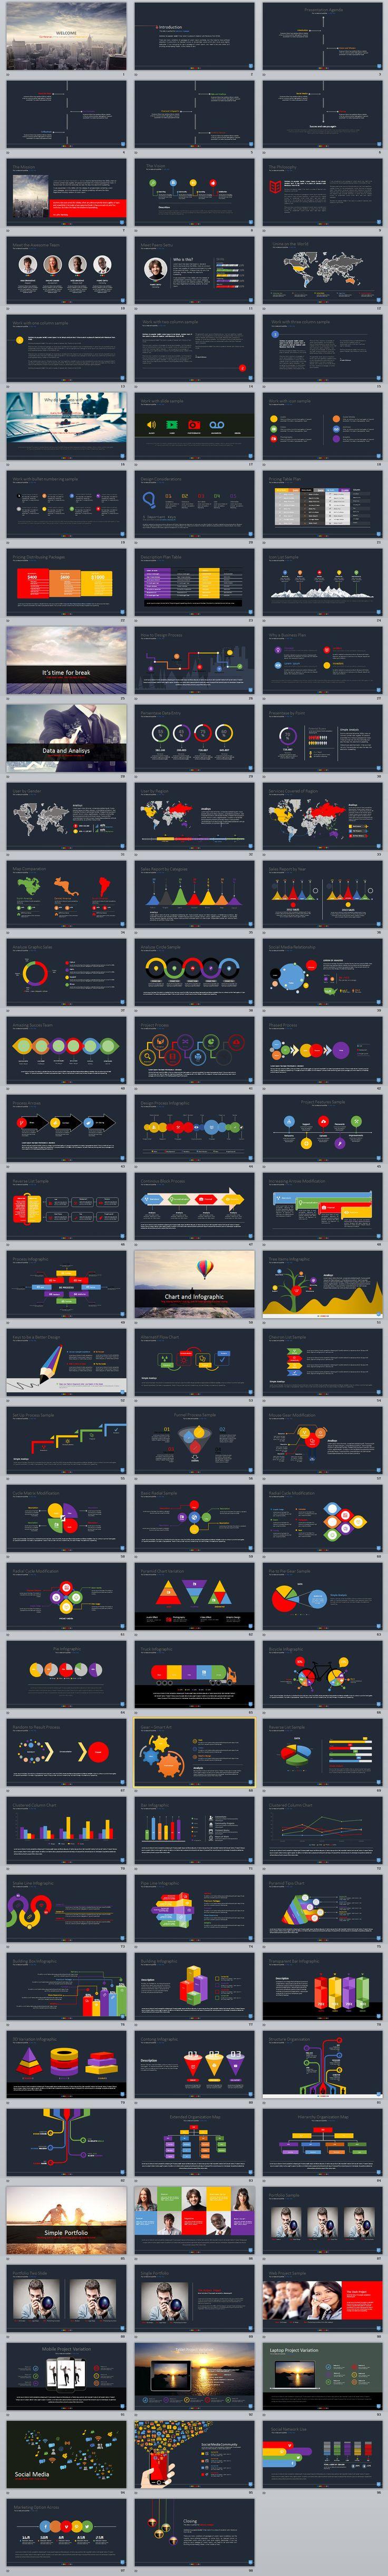 107 best Powerpoint est mon ami images on Pinterest | Tutorials, 30 ...